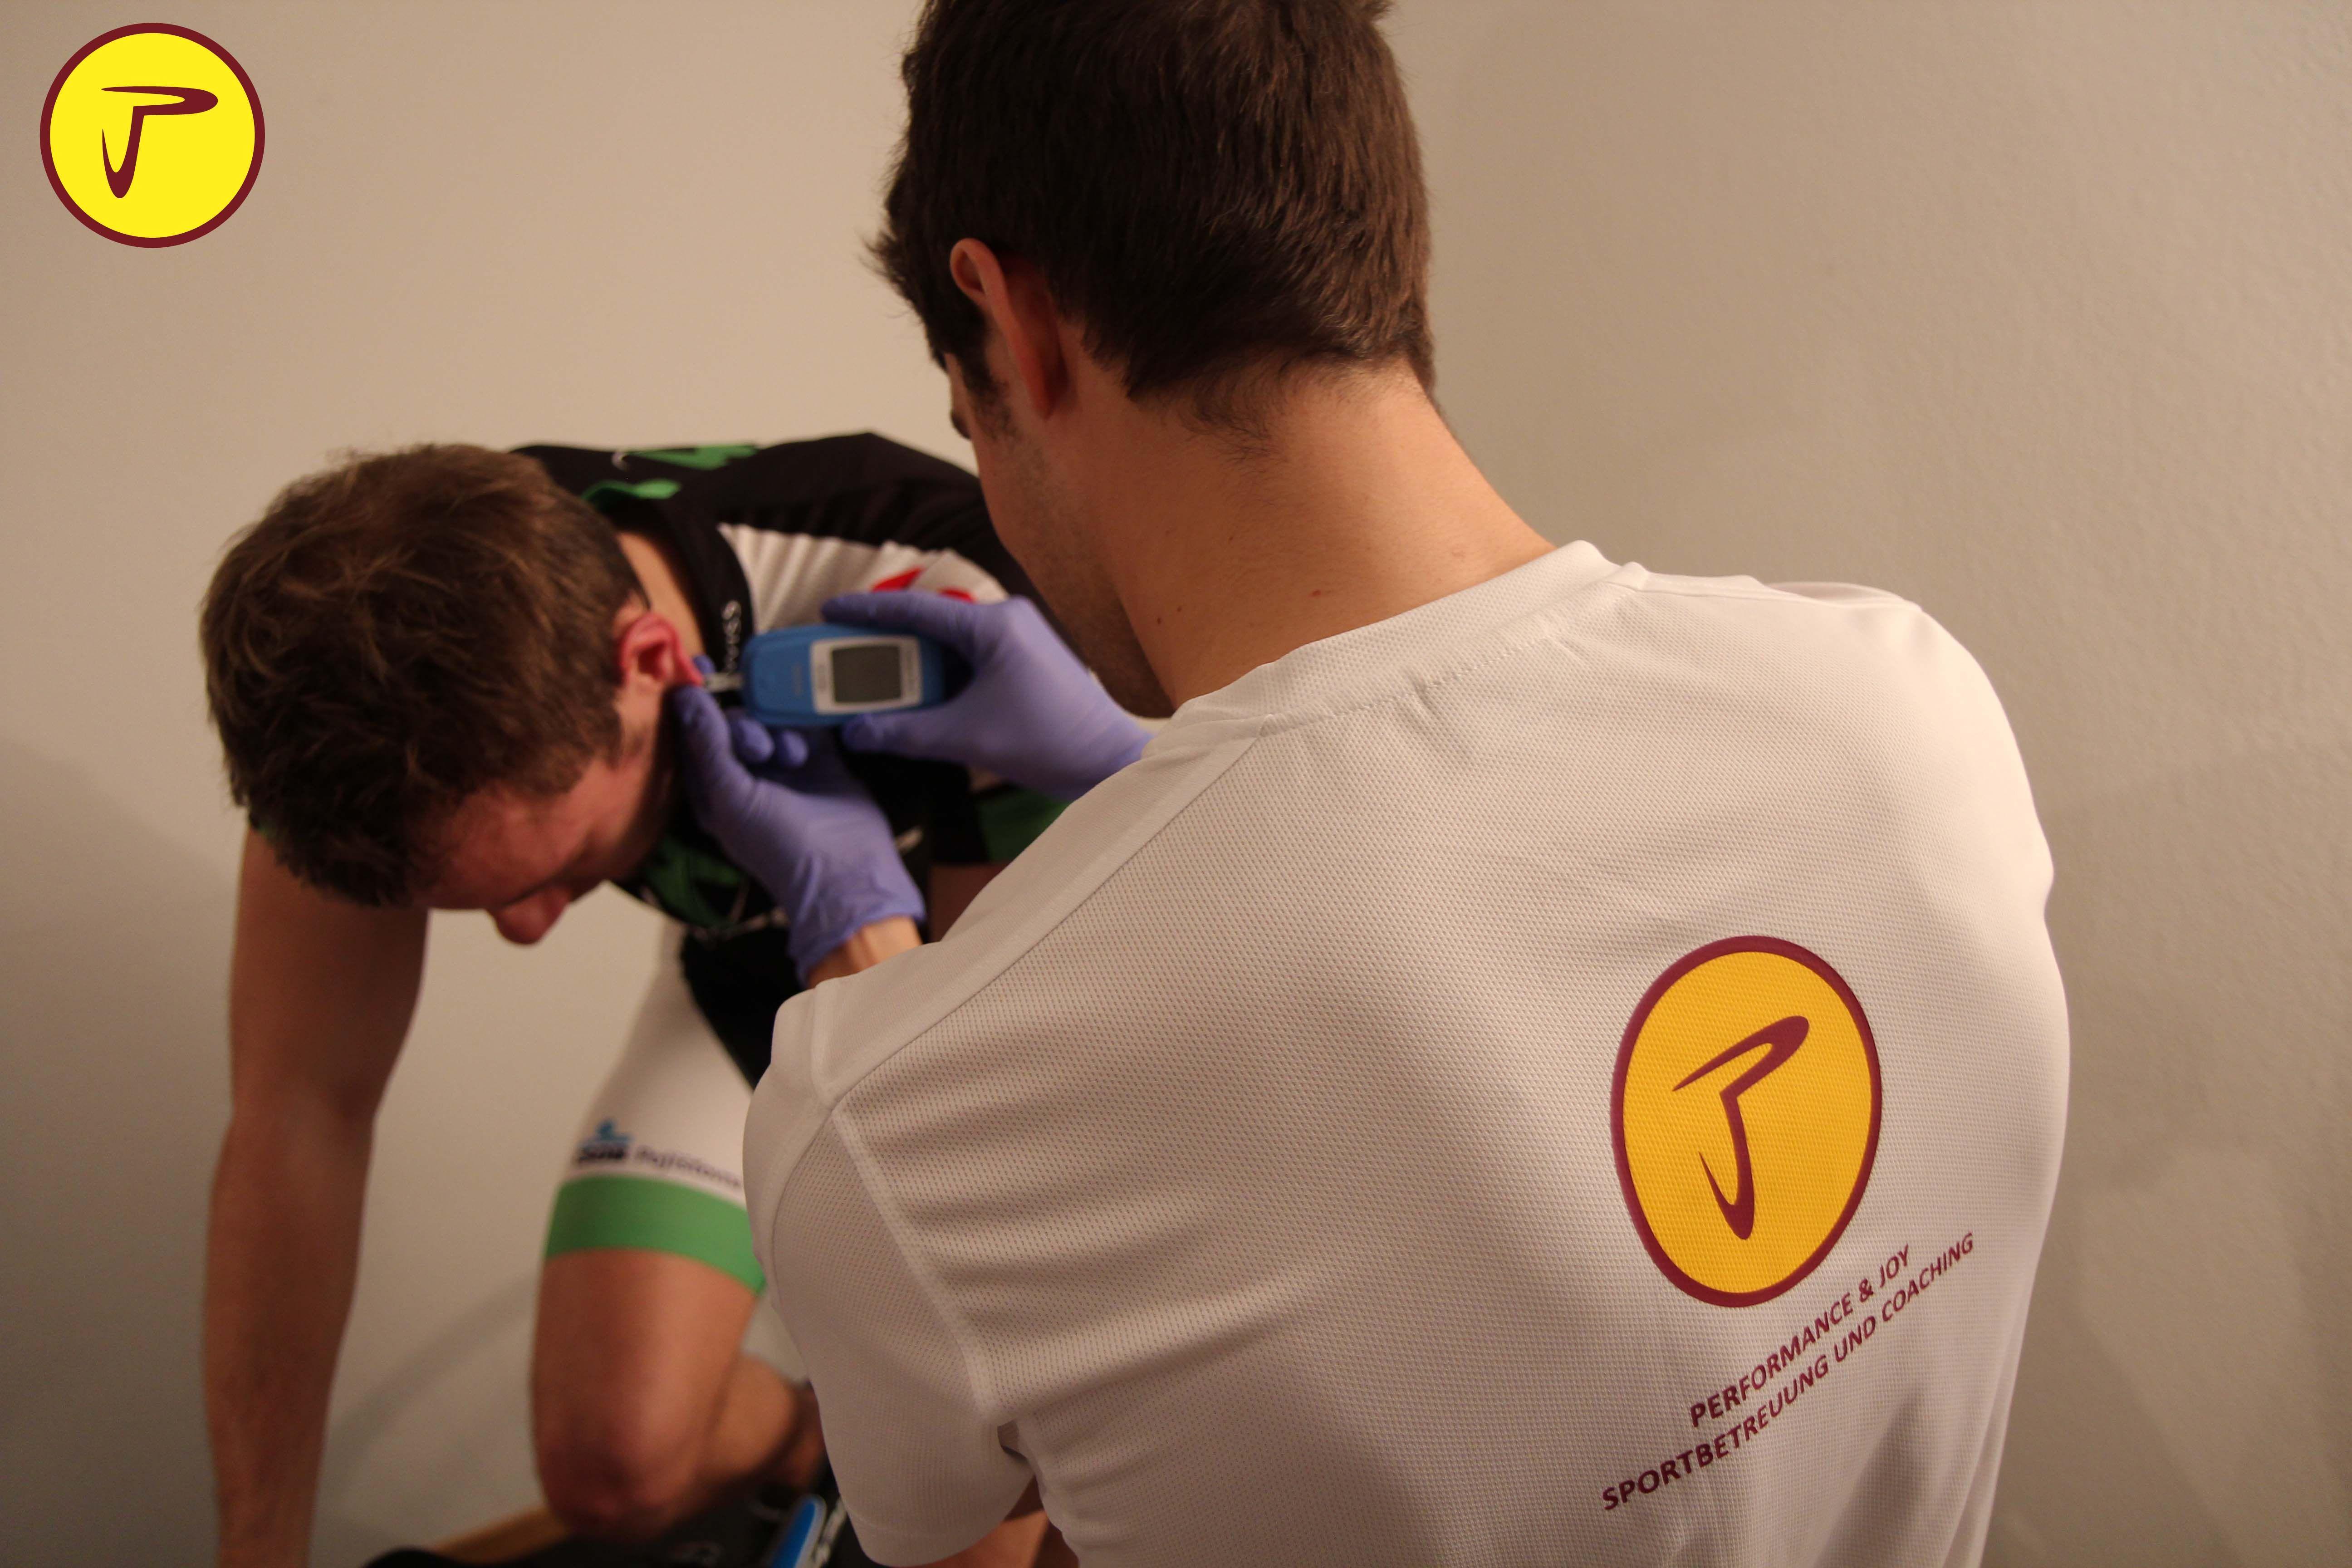 performance diagnostics with dave #performanceandjoy http://performanceandjoy.ch/leistungsdiagnostik